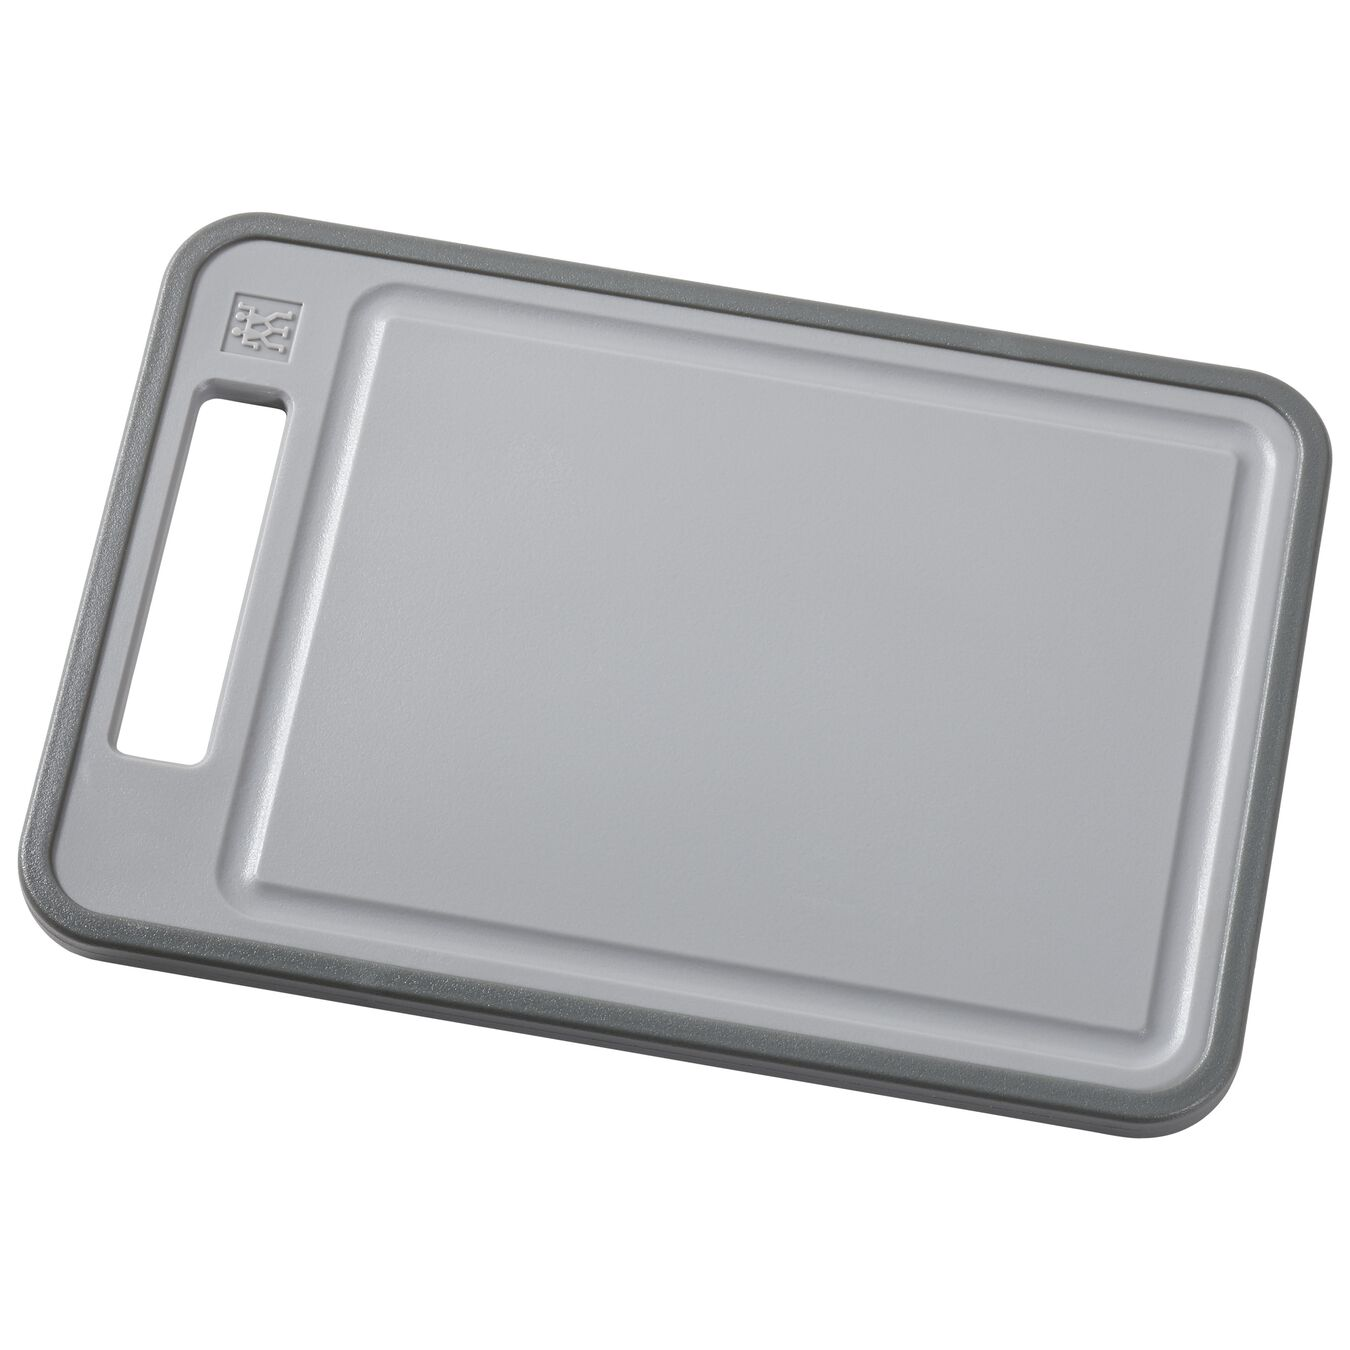 Tagliere - 29 cm x 20 cm, grigio,,large 1